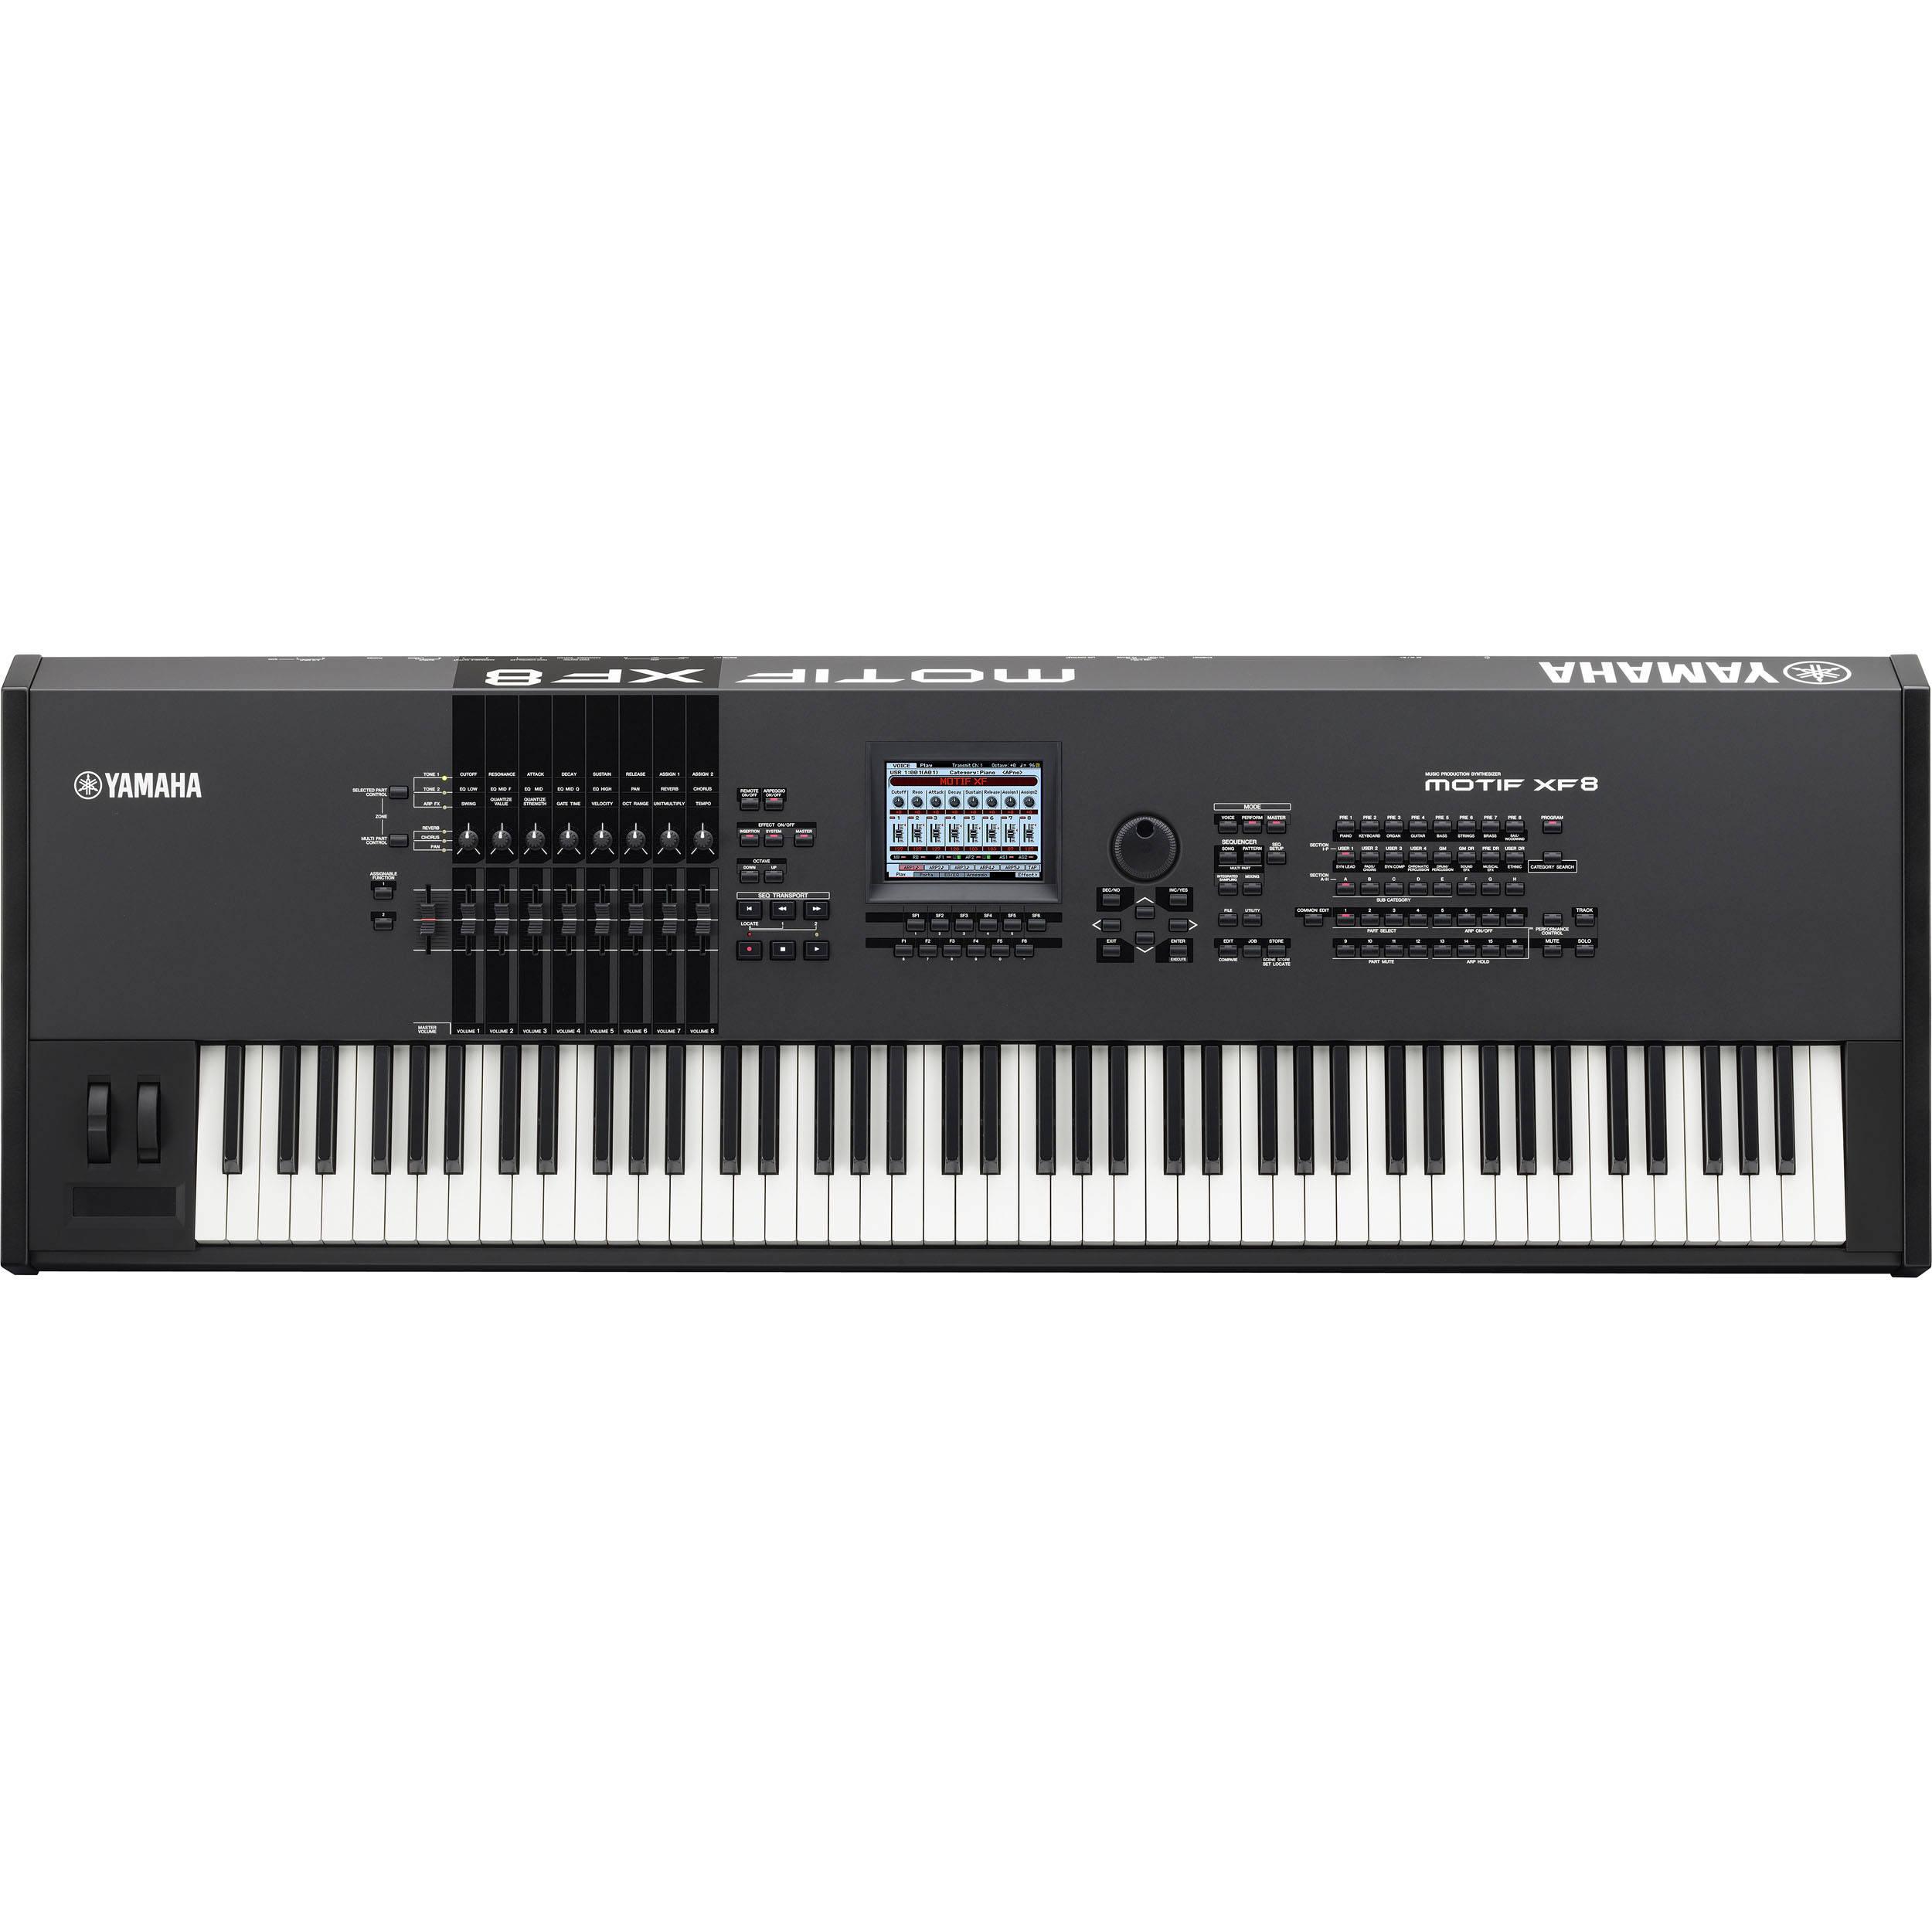 Yamaha motif xf8 workstation keyboard motifxf8 b h photo video for Yamaha motif keyboard